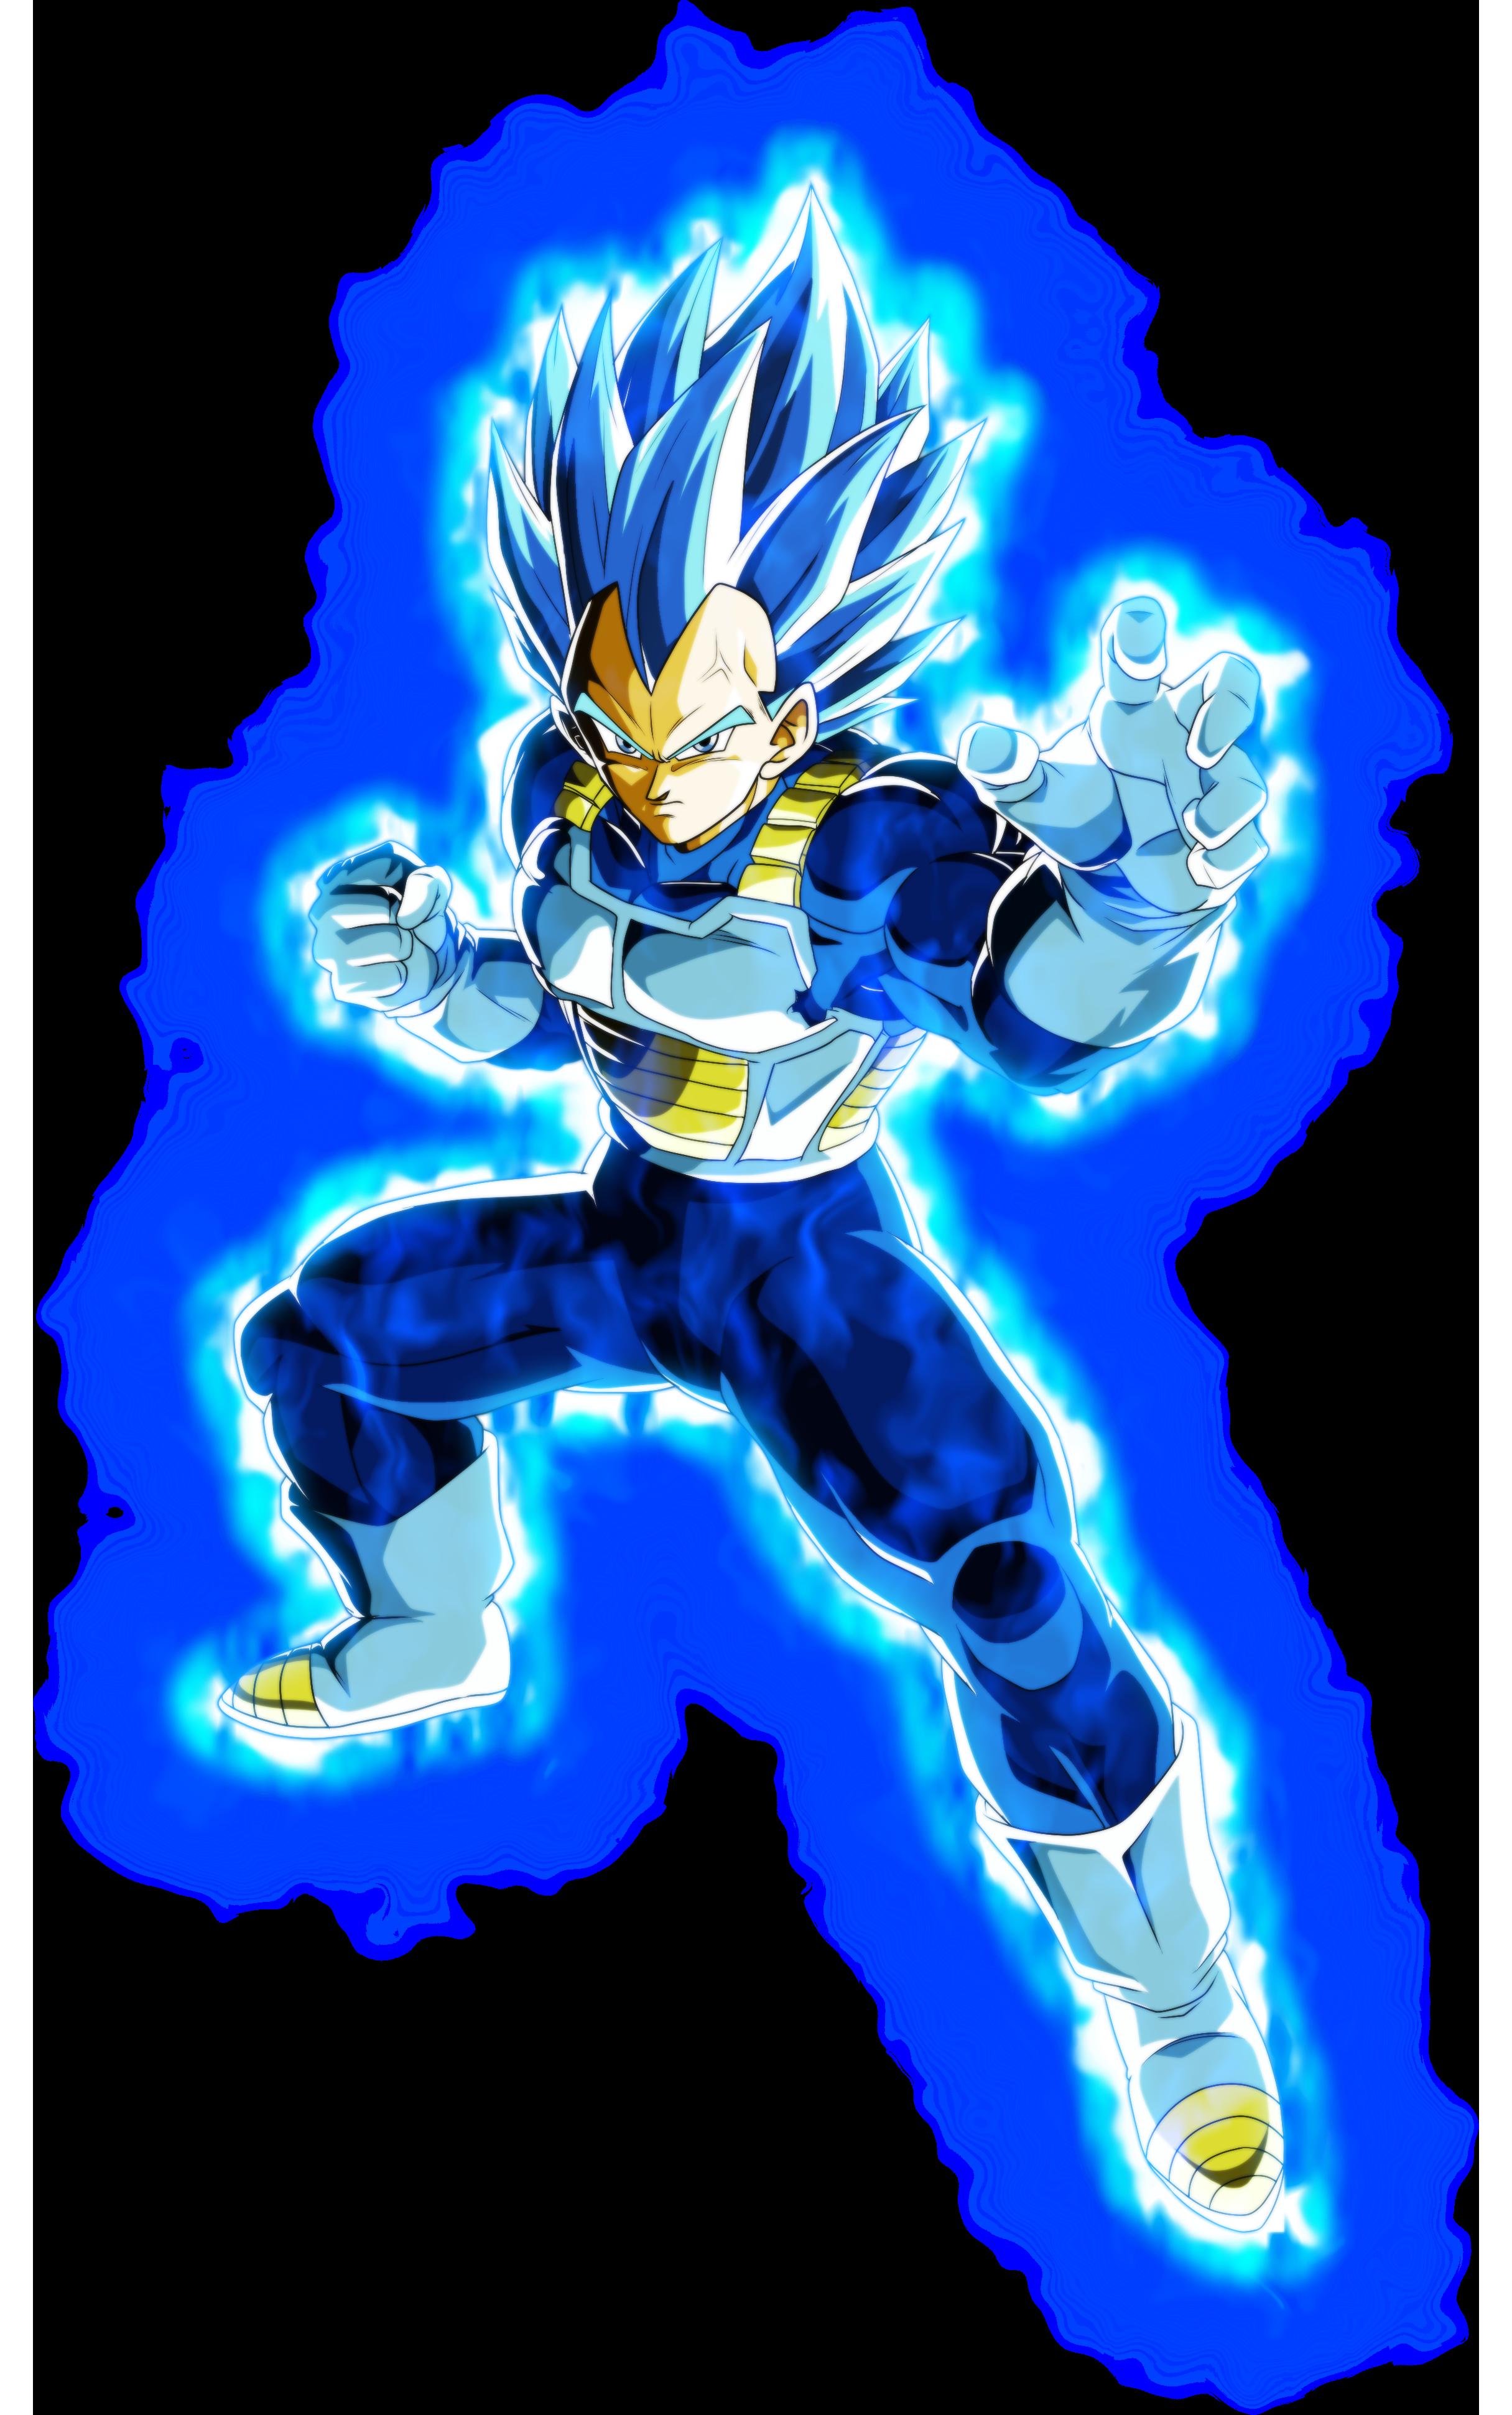 Lr Blue Evolution Vegeta W Aura By Blackflim On Deviantart In 2021 Anime Dragon Ball Super Dragon Ball Wallpapers Dragon Ball Artwork